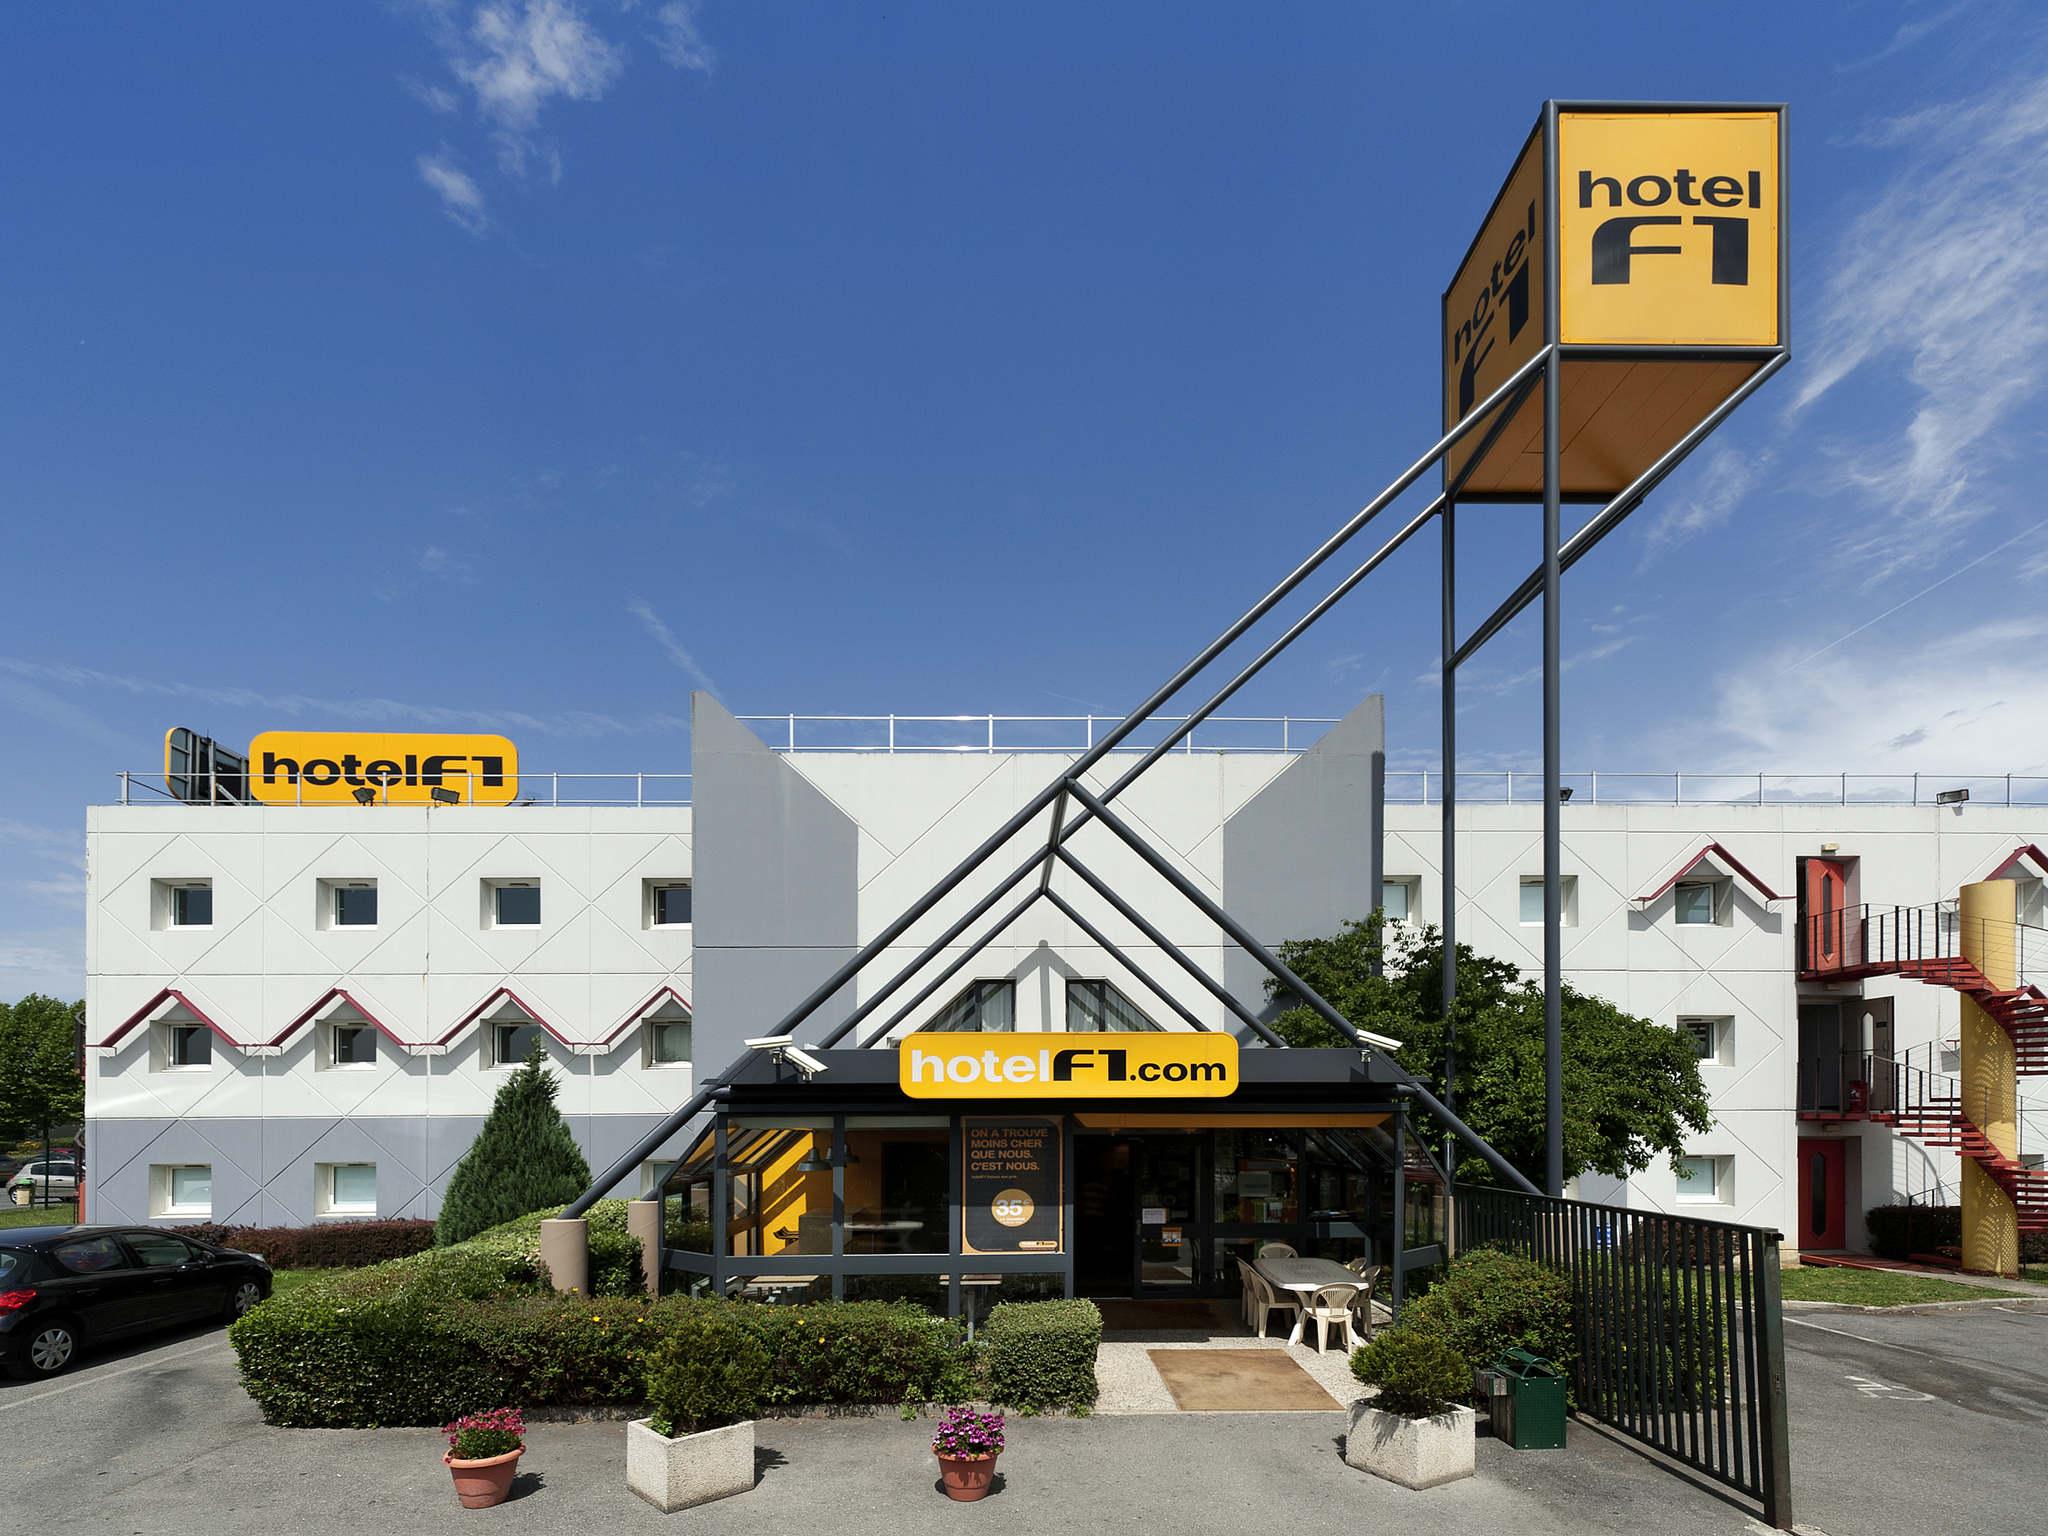 Hotel – hotelF1 Moulins Sud